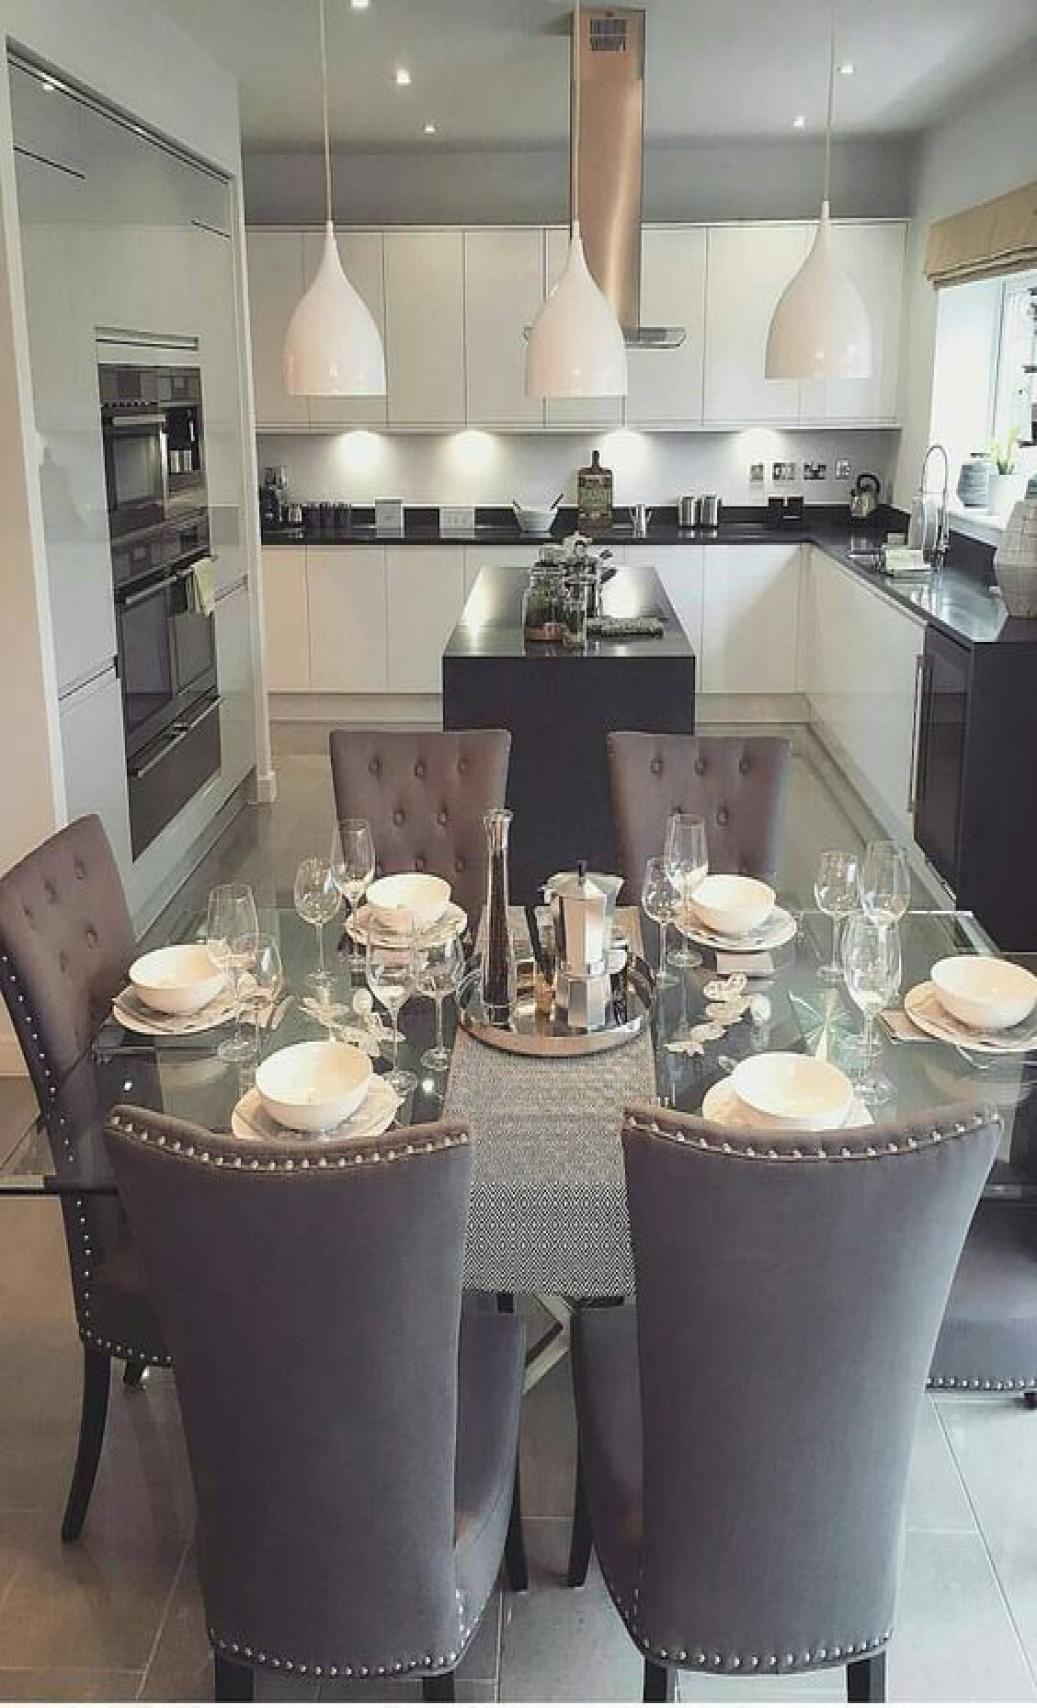 46 Chic Modern Farmhouse Kitchen Decor Ideas Dining Table Decor Home Decor Kitchen Luxury Dining Room